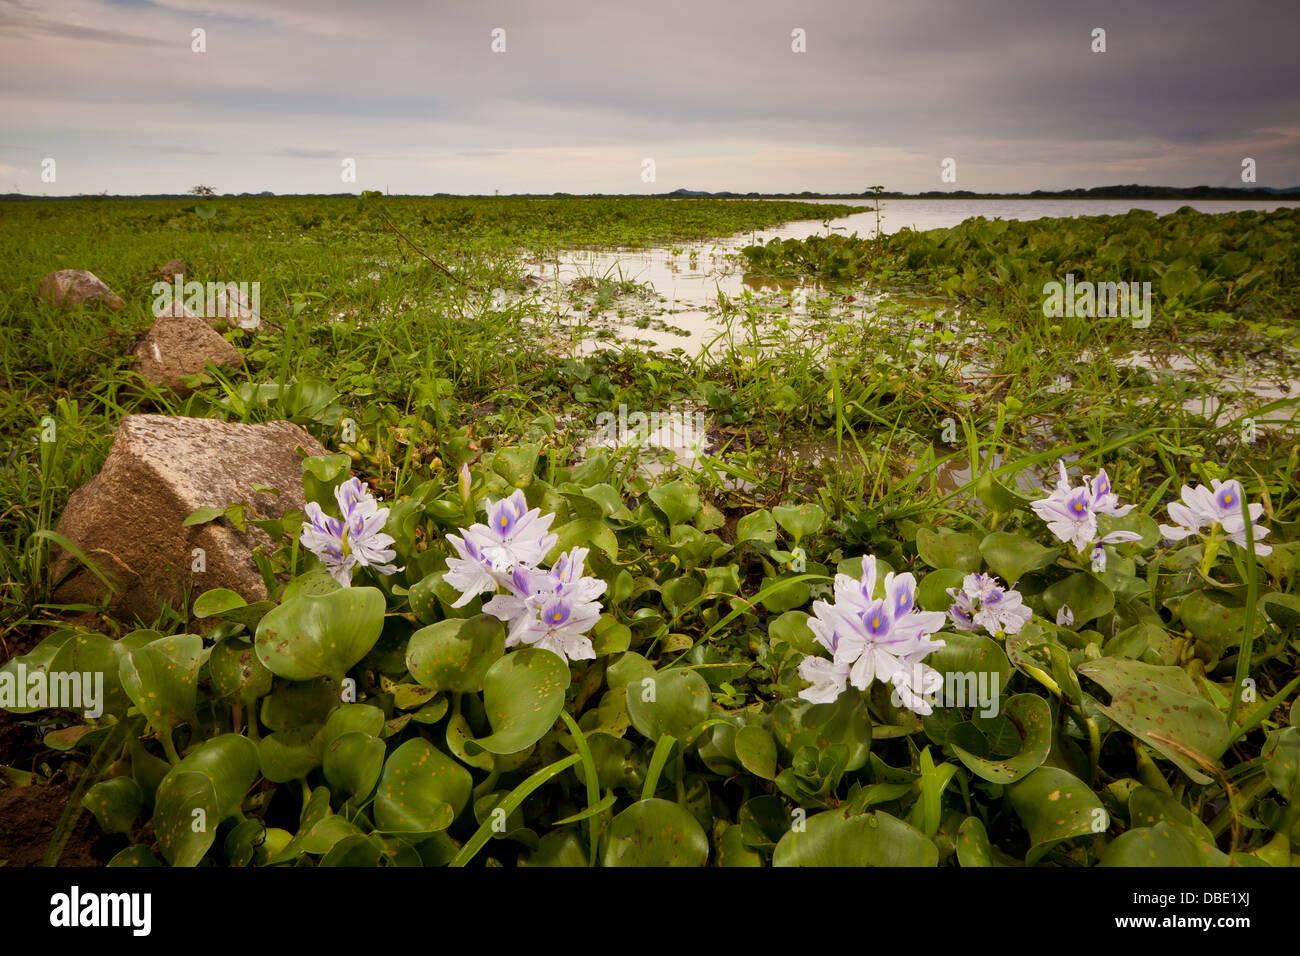 Lily flowers in the wetlands Refugio de vida Silvestre Cienaga las Macanas Nature Reserve, Herrera province, Republic Stock Photo